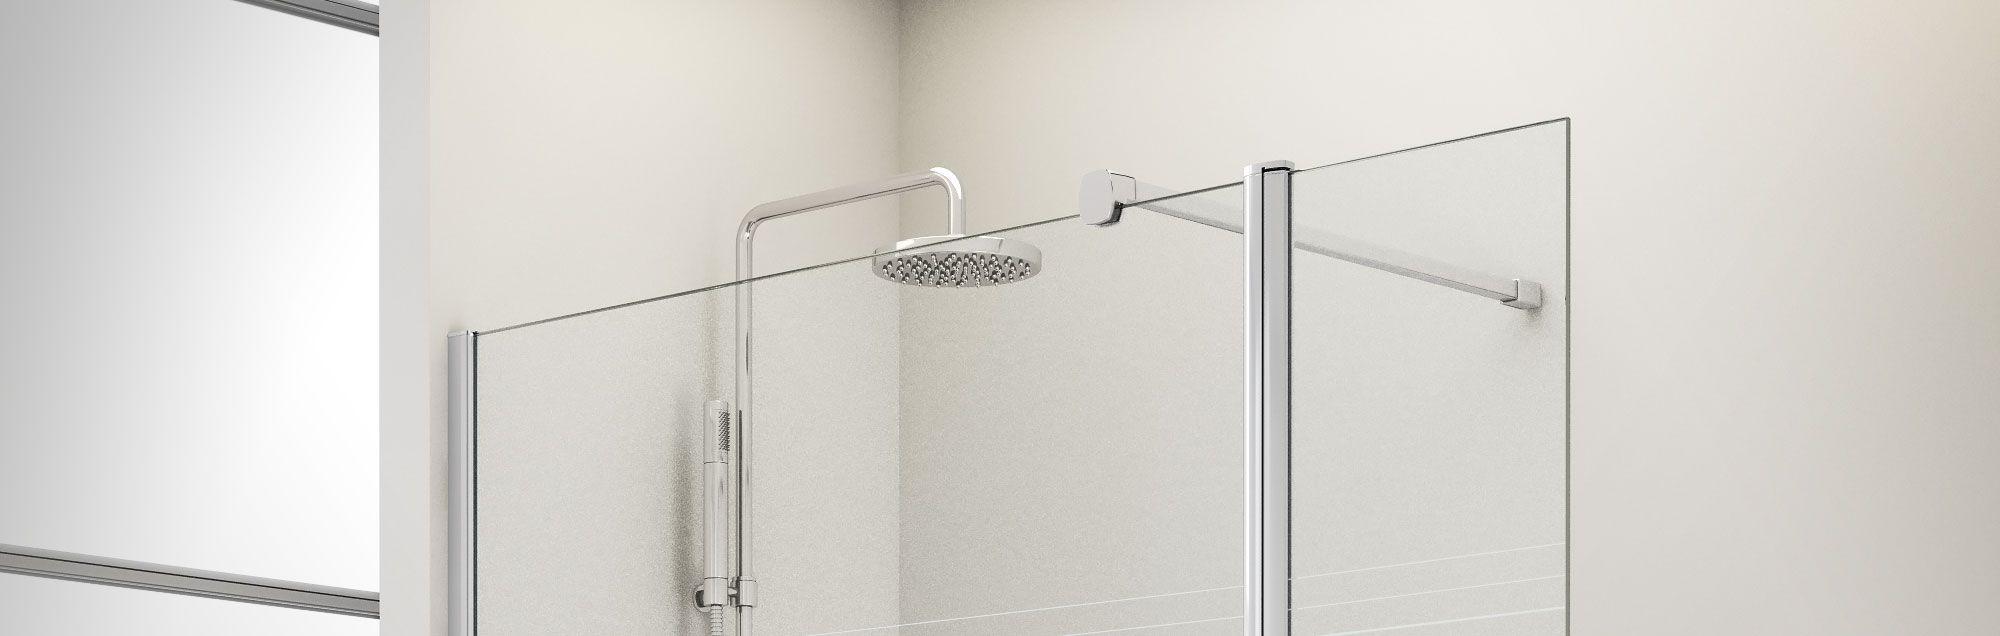 Mamparas standard de bañera a medida PROFILTEK